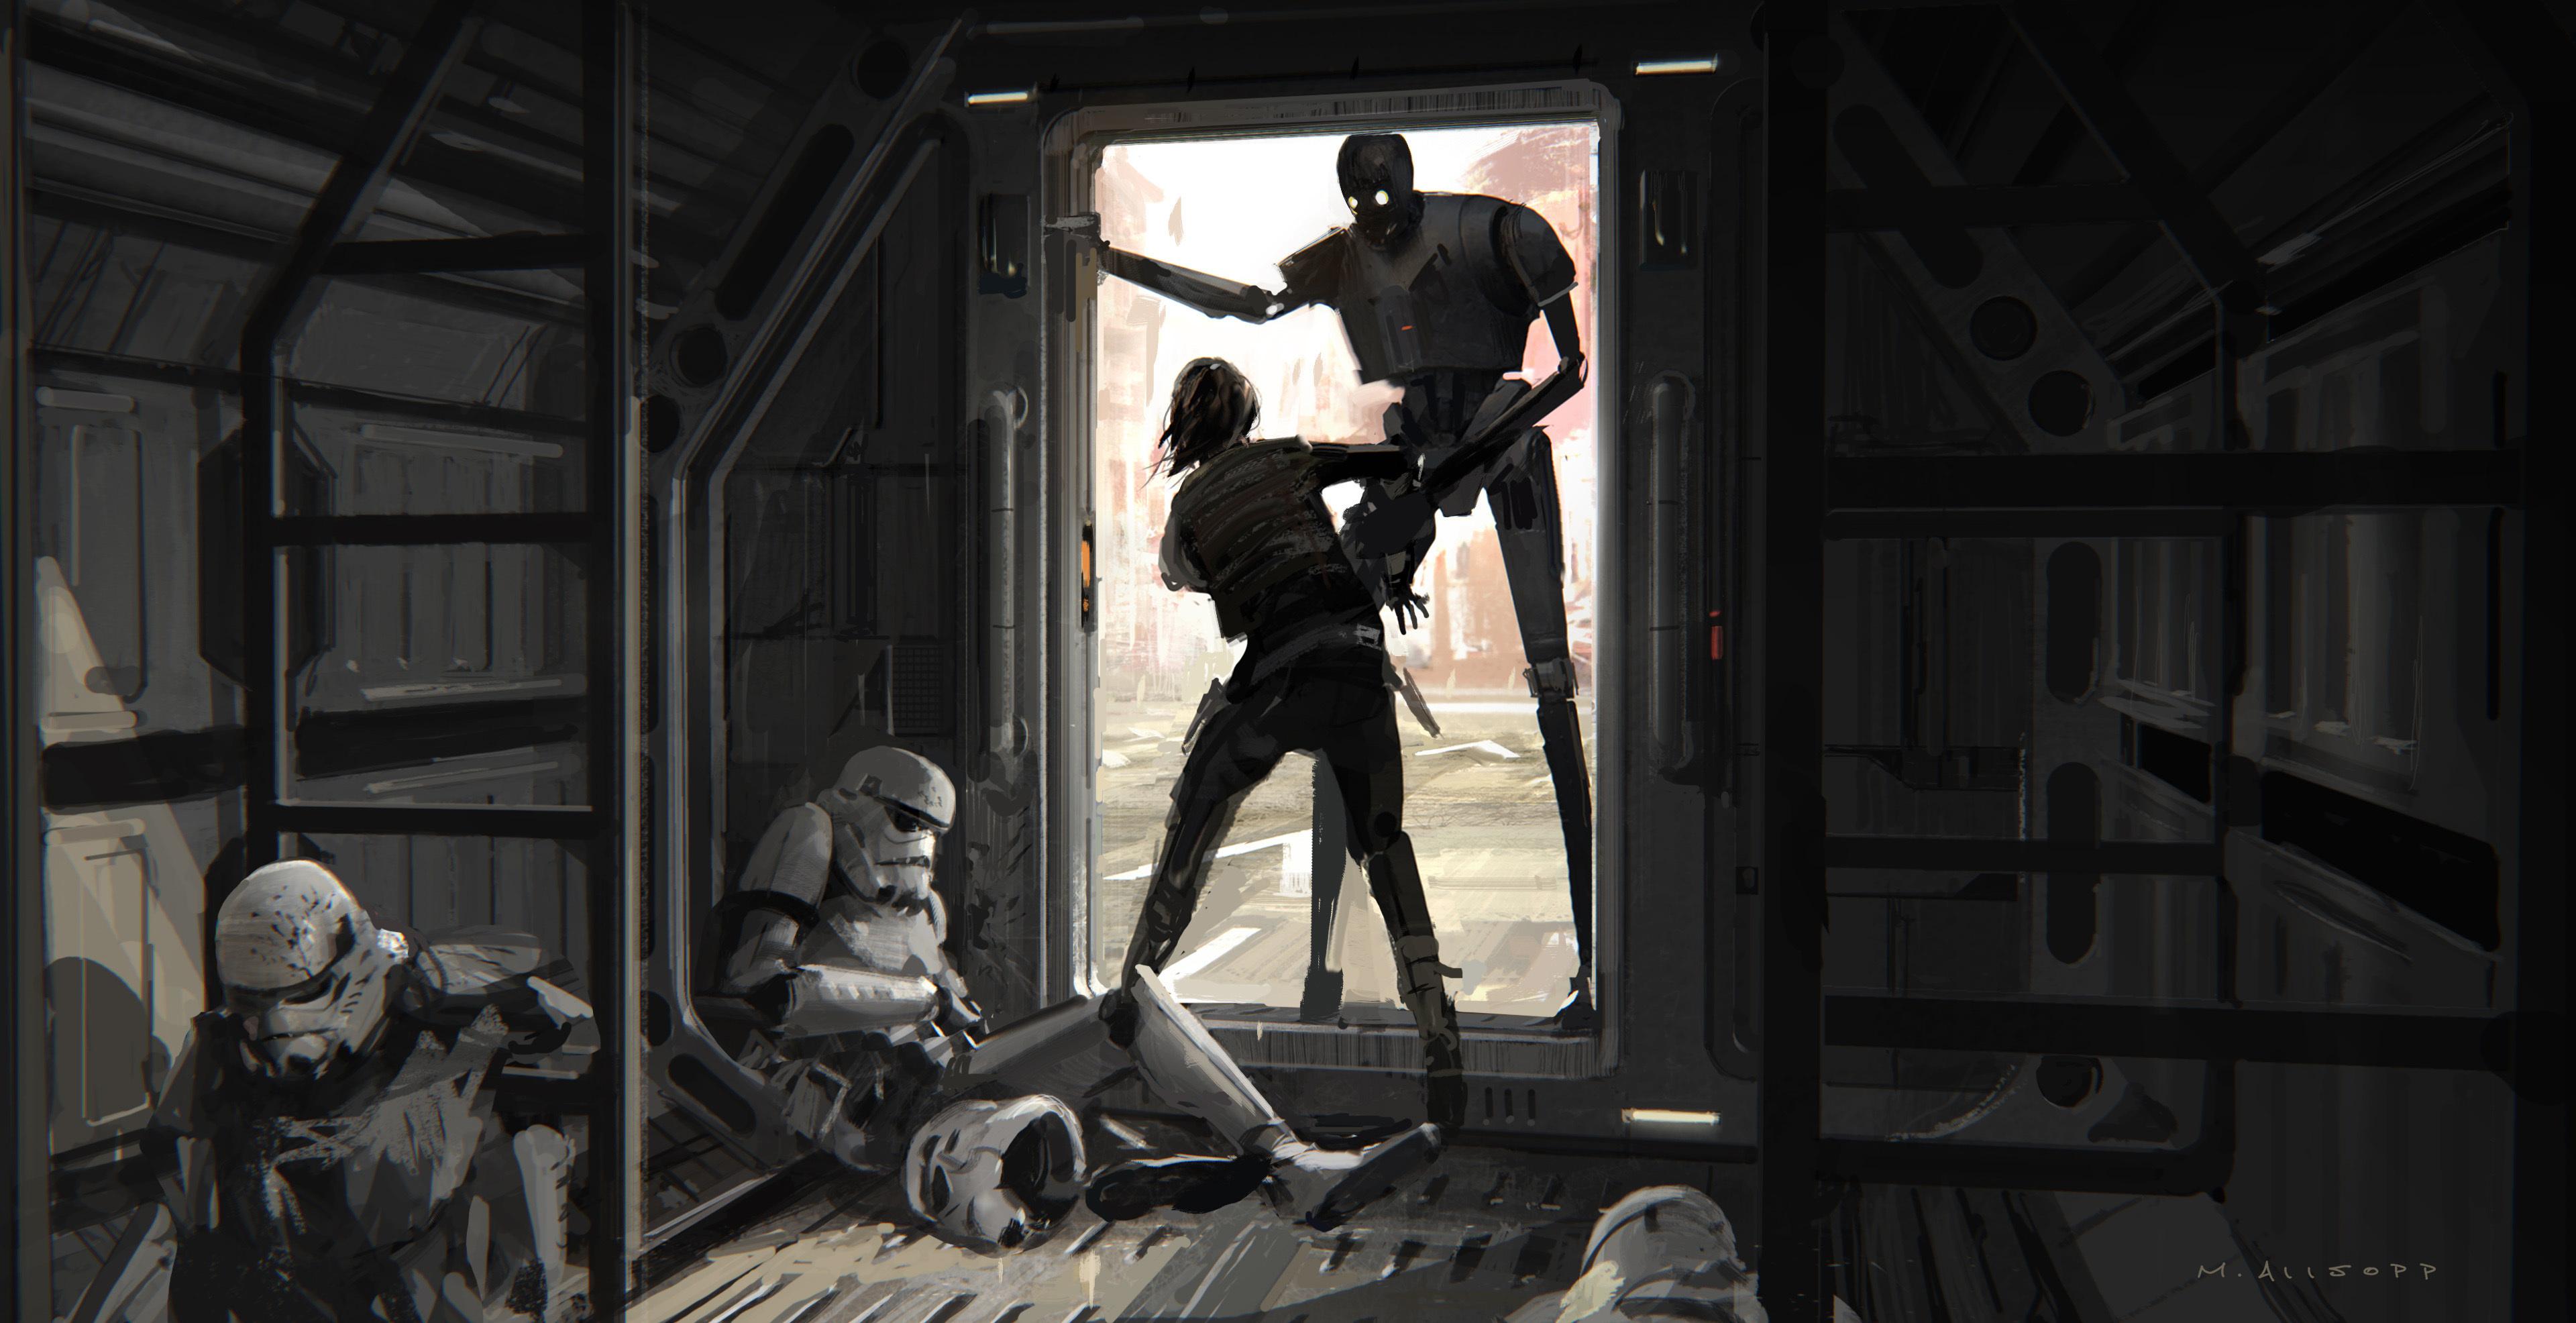 A Star Wars Story Artwork Movie Robots Stormtrooper Rogue One K2so Concept Art 3840x1972 Wallpaper Teahub Io